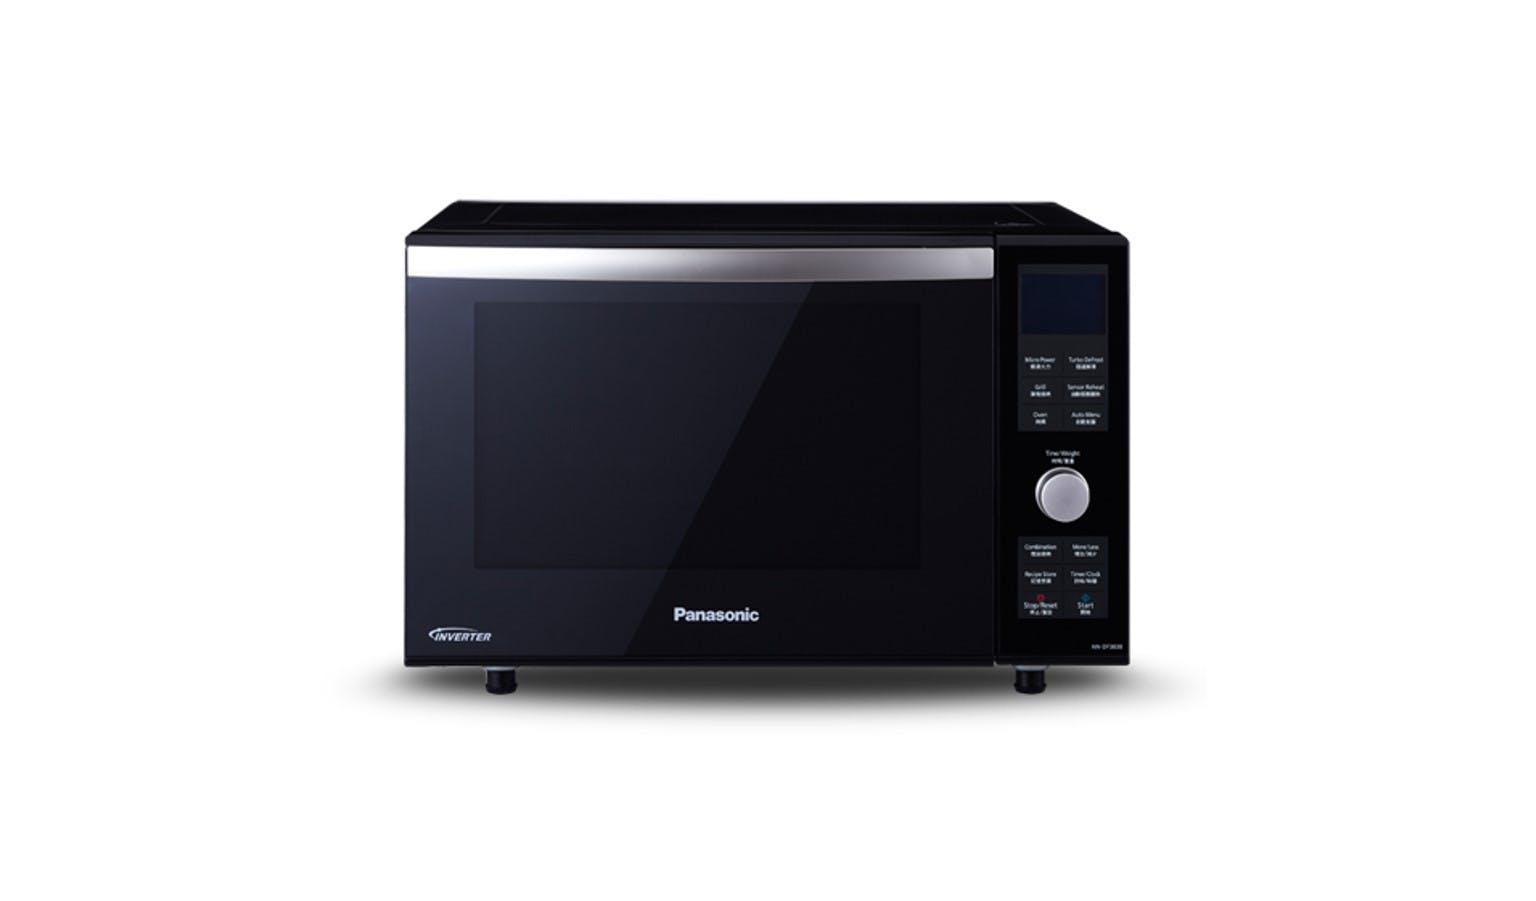 Panasonic Nn Df383bypq 23l Microwave